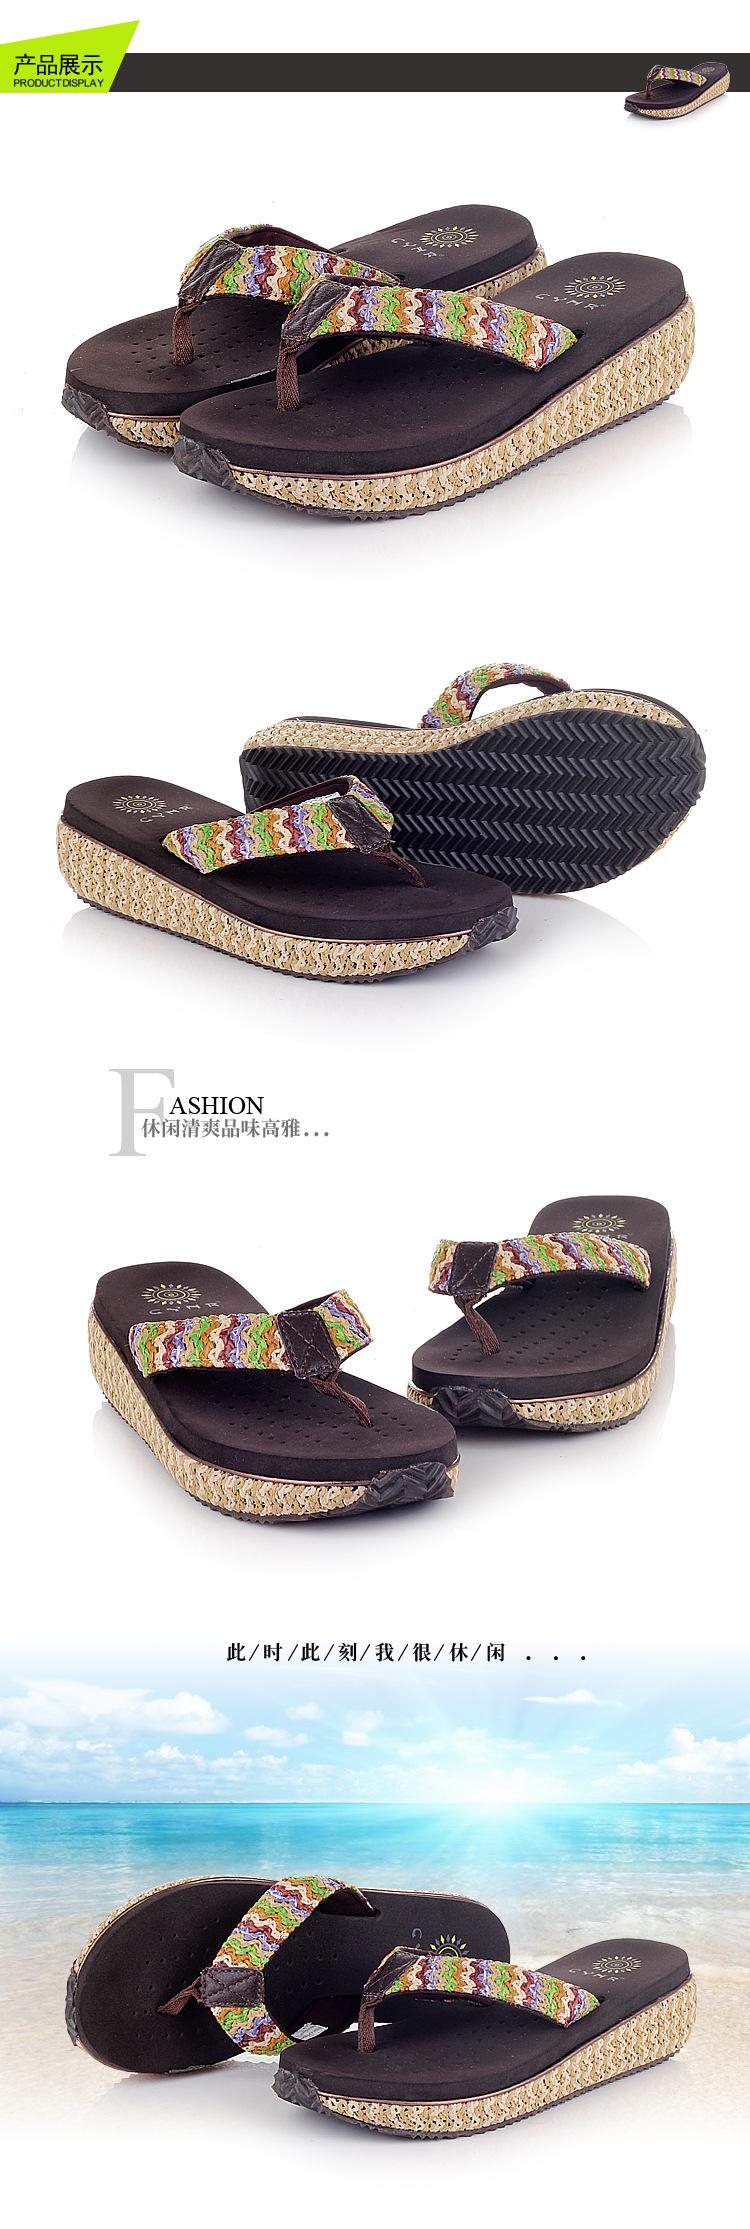 Bohemian Cane Sandals Summer Wedged Platform 2015 New Brand Gladiator Women Shoes Flip Flops